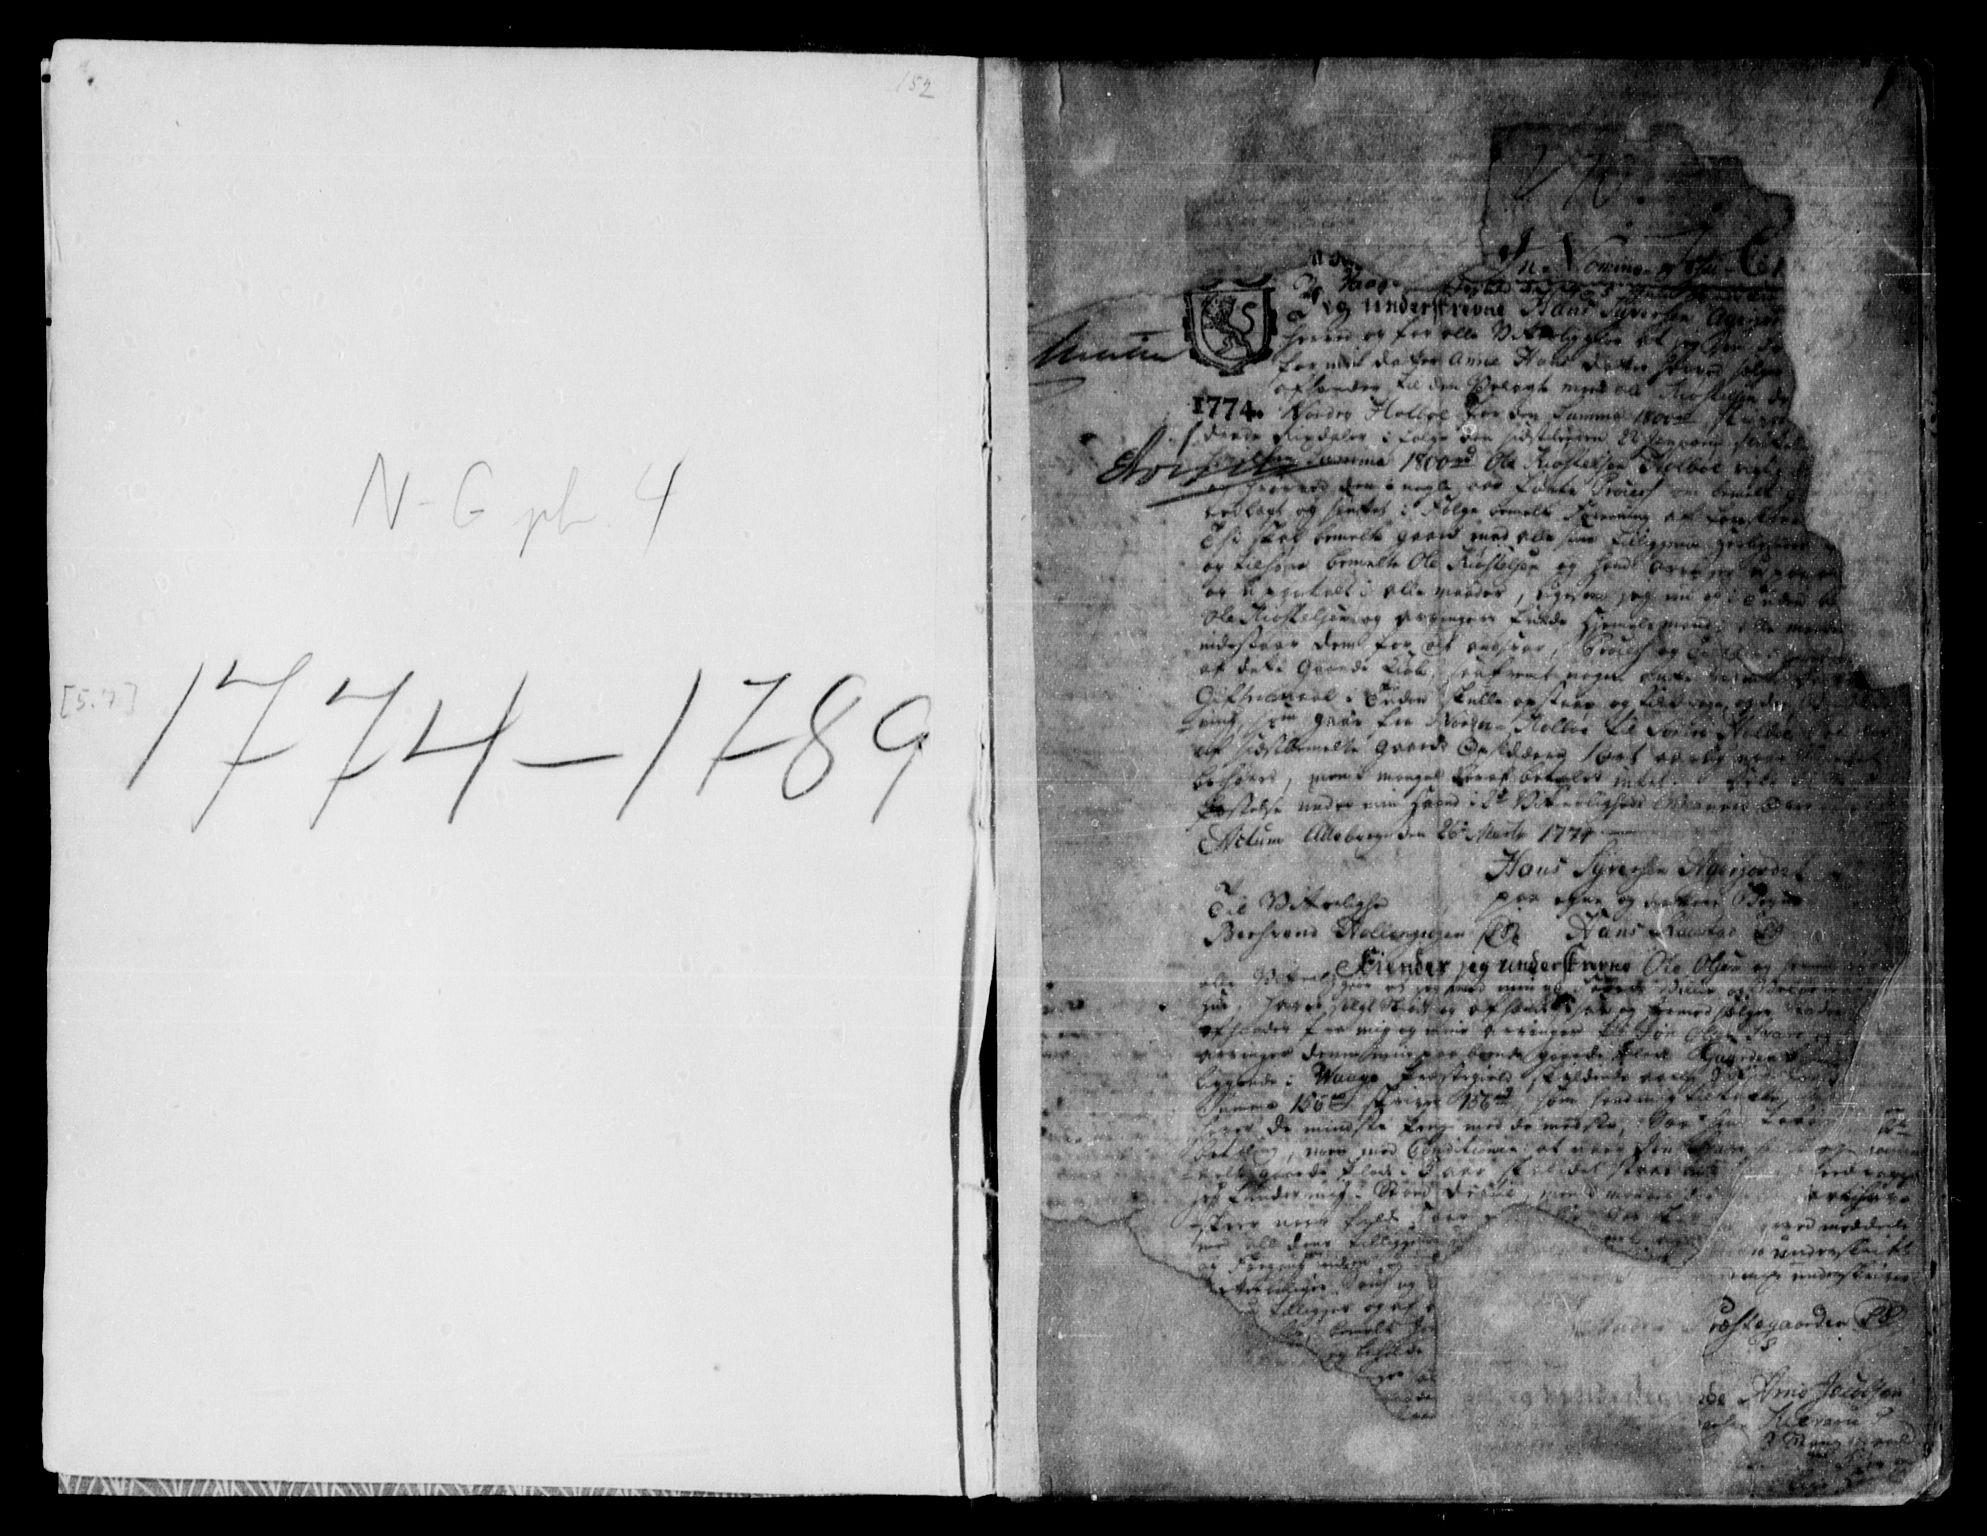 SAH, Nord-Gudbrandsdal tingrett, H/Hb/Hba/L0003: Pantebok nr. 3, 1774-1789, s. 1